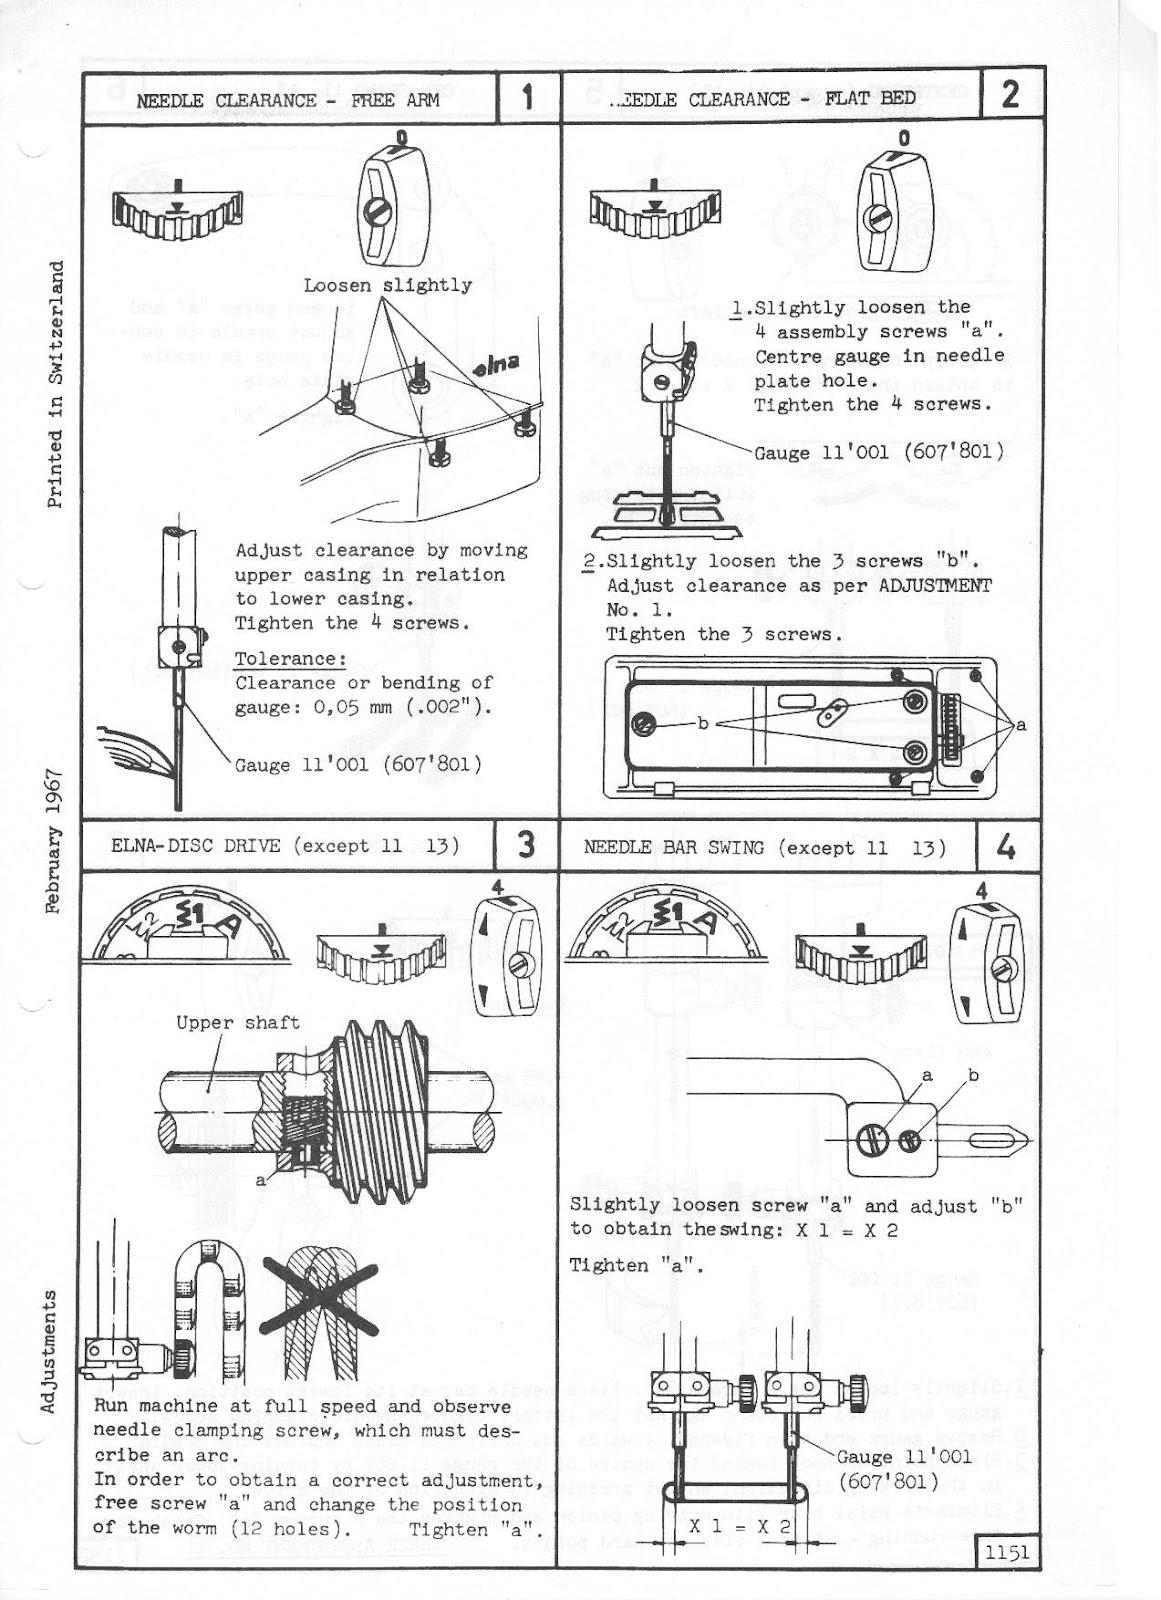 Juki service manual Pdf